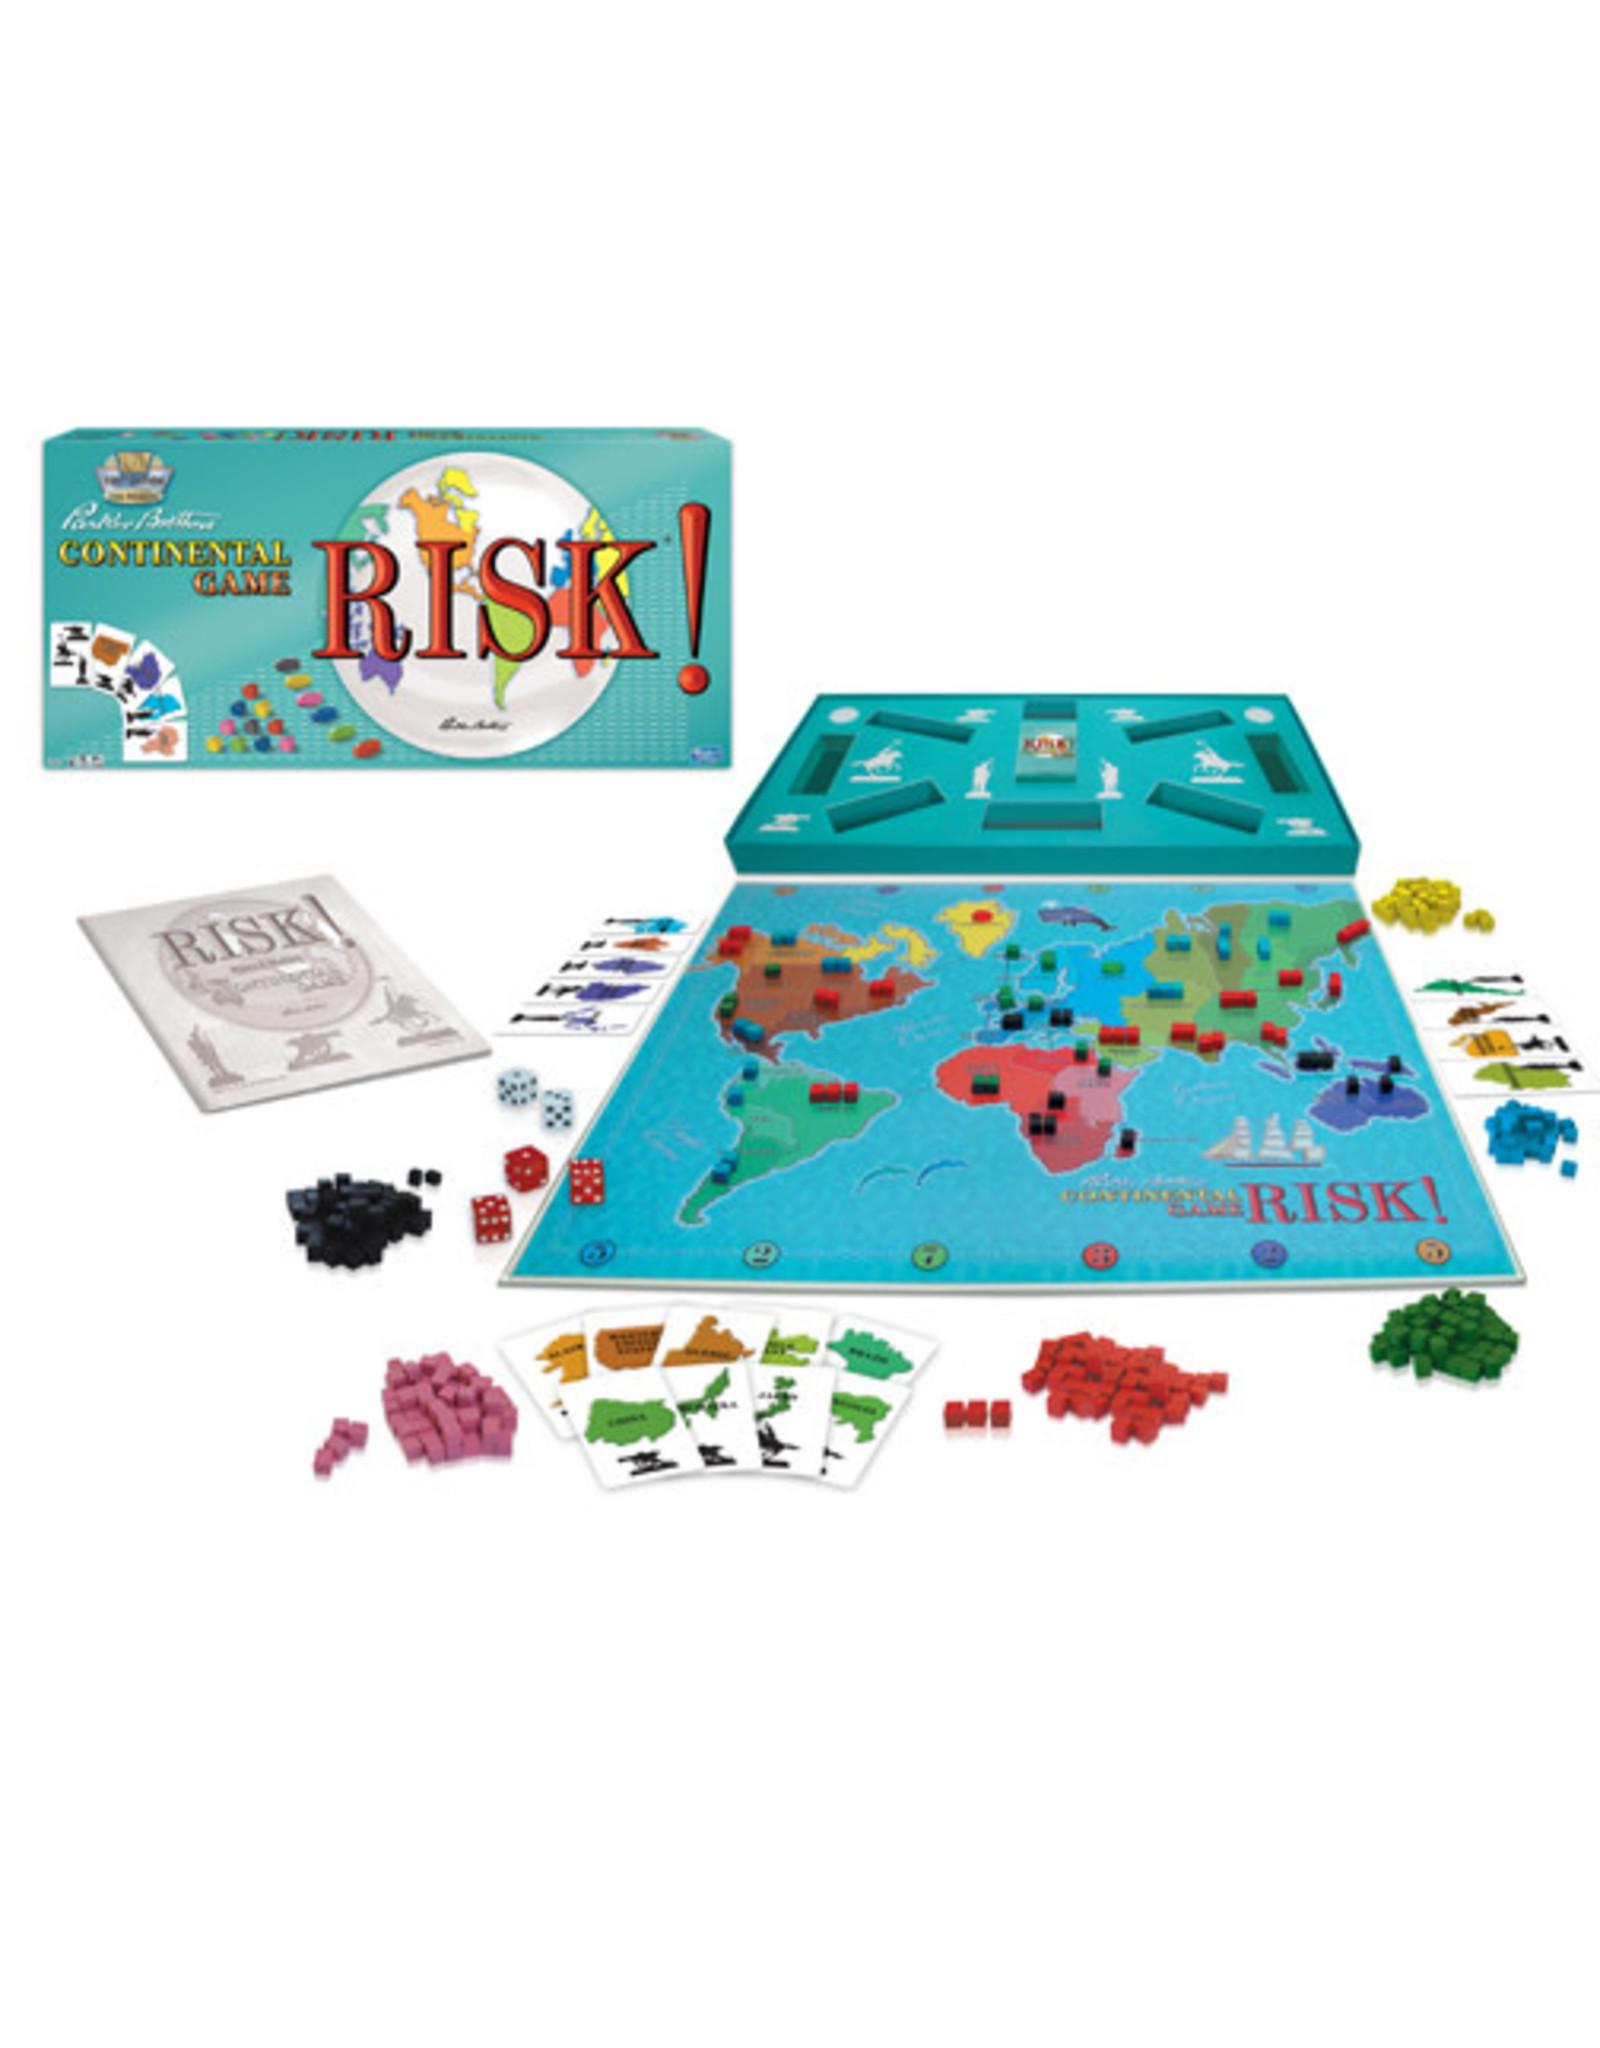 Risk 1959 Board Game